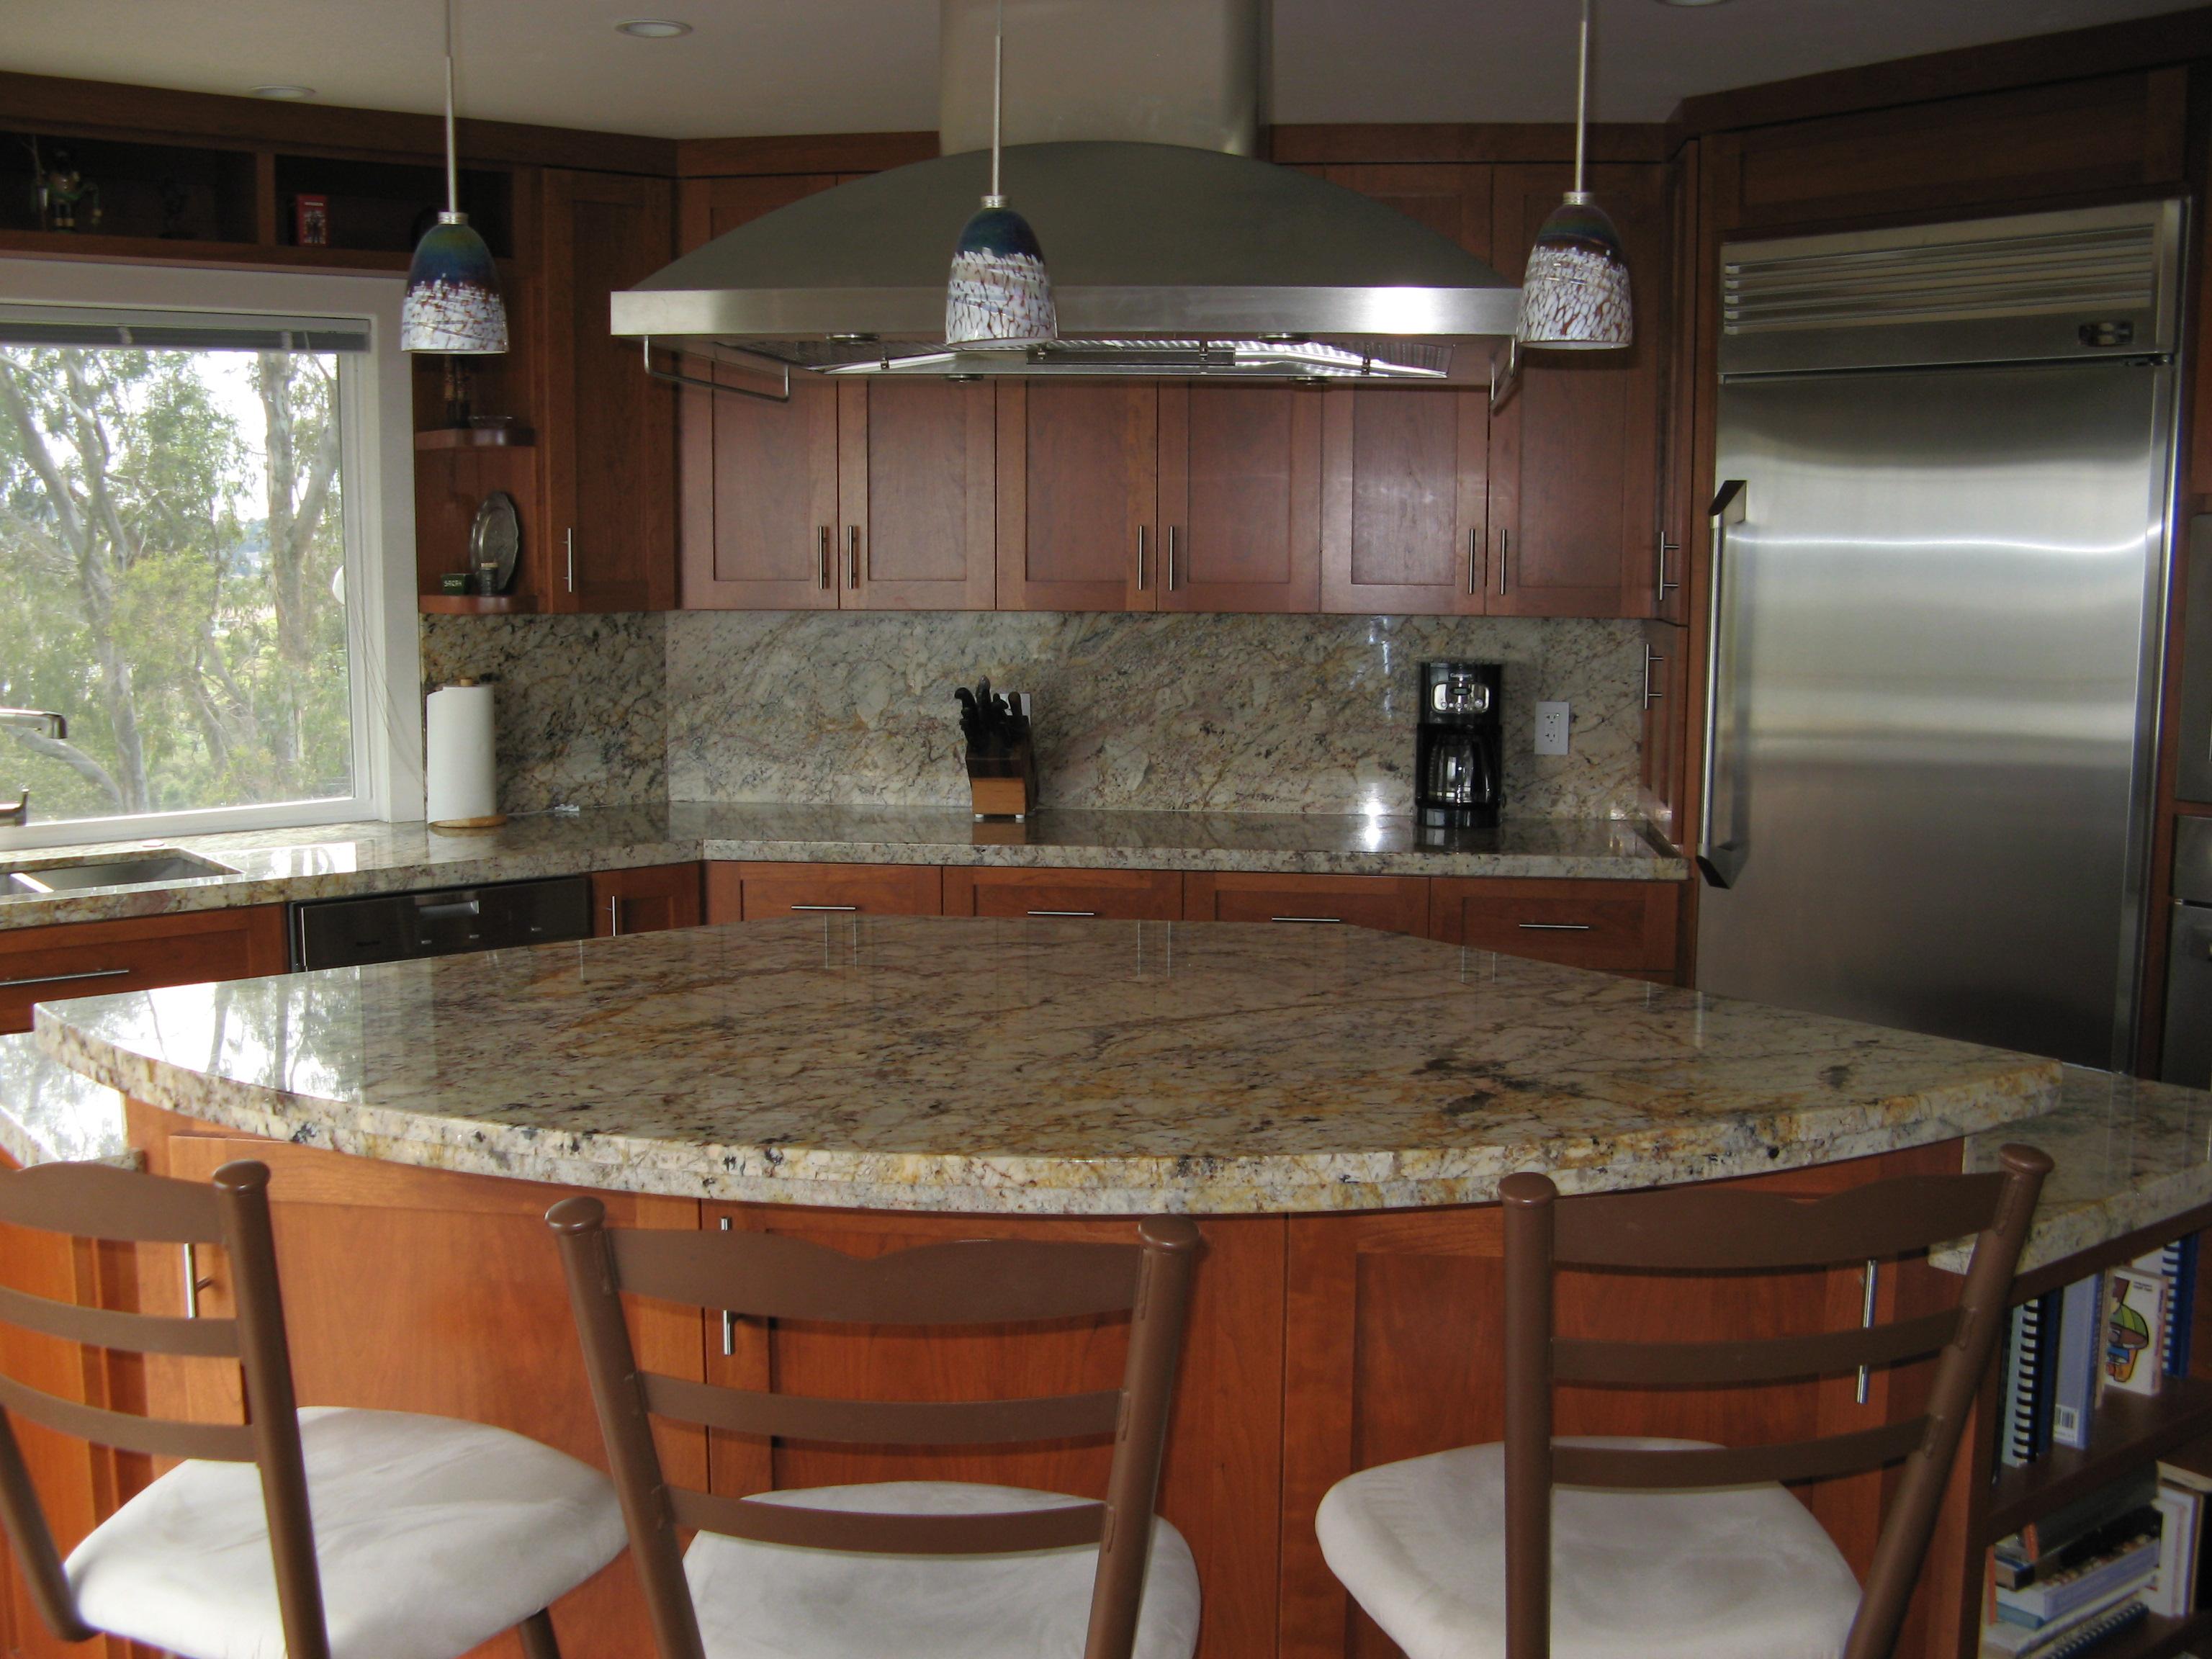 Kitchen Remodeling Ideas Pictures & Photos on Small:_Tken7Avcza= Kitchen Renovation Ideas  id=87782